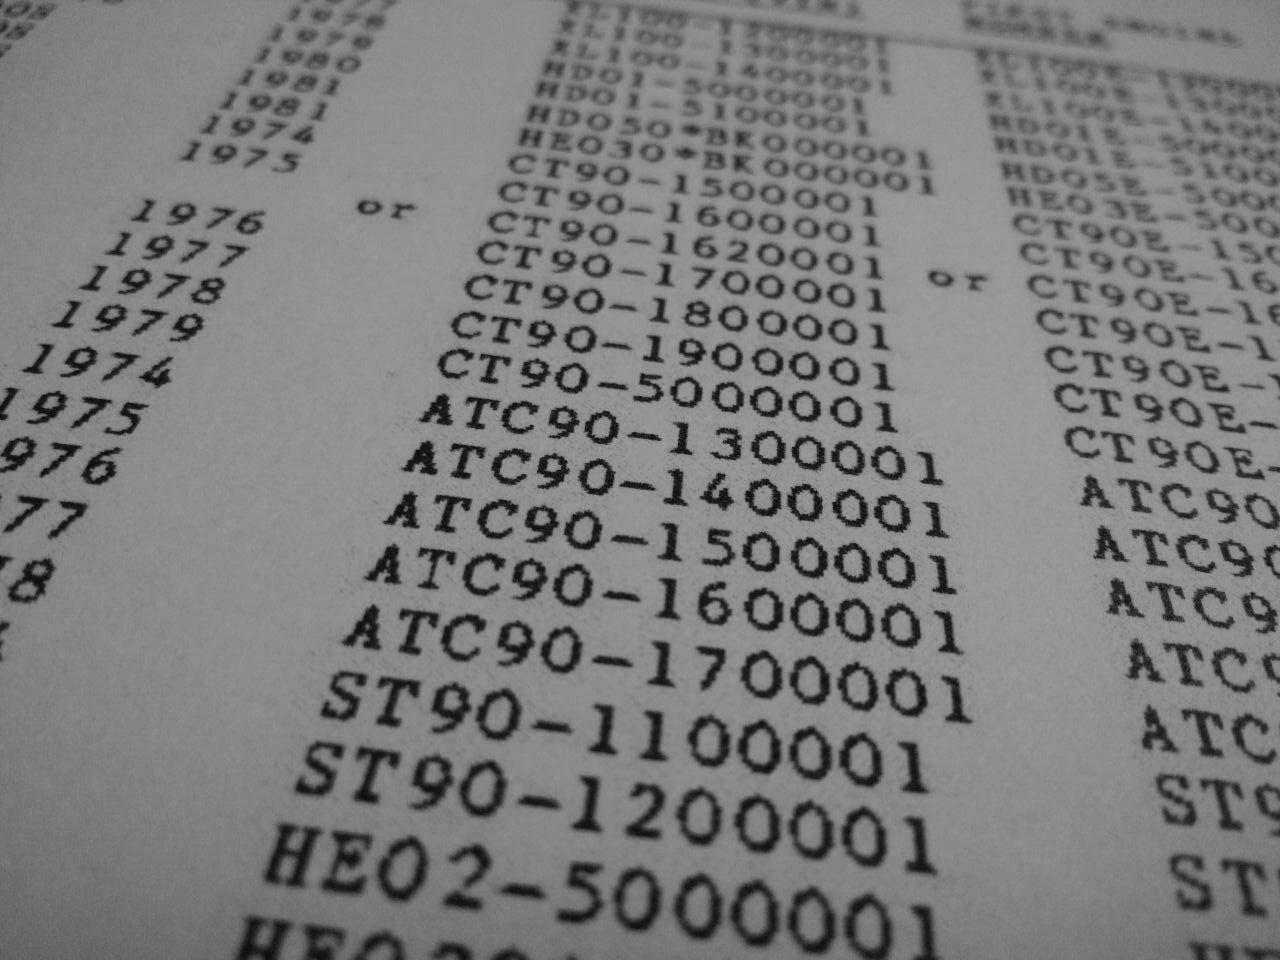 New Data Added To The Honda Vin Database Ss50 Wiring Diagram Motorcyle